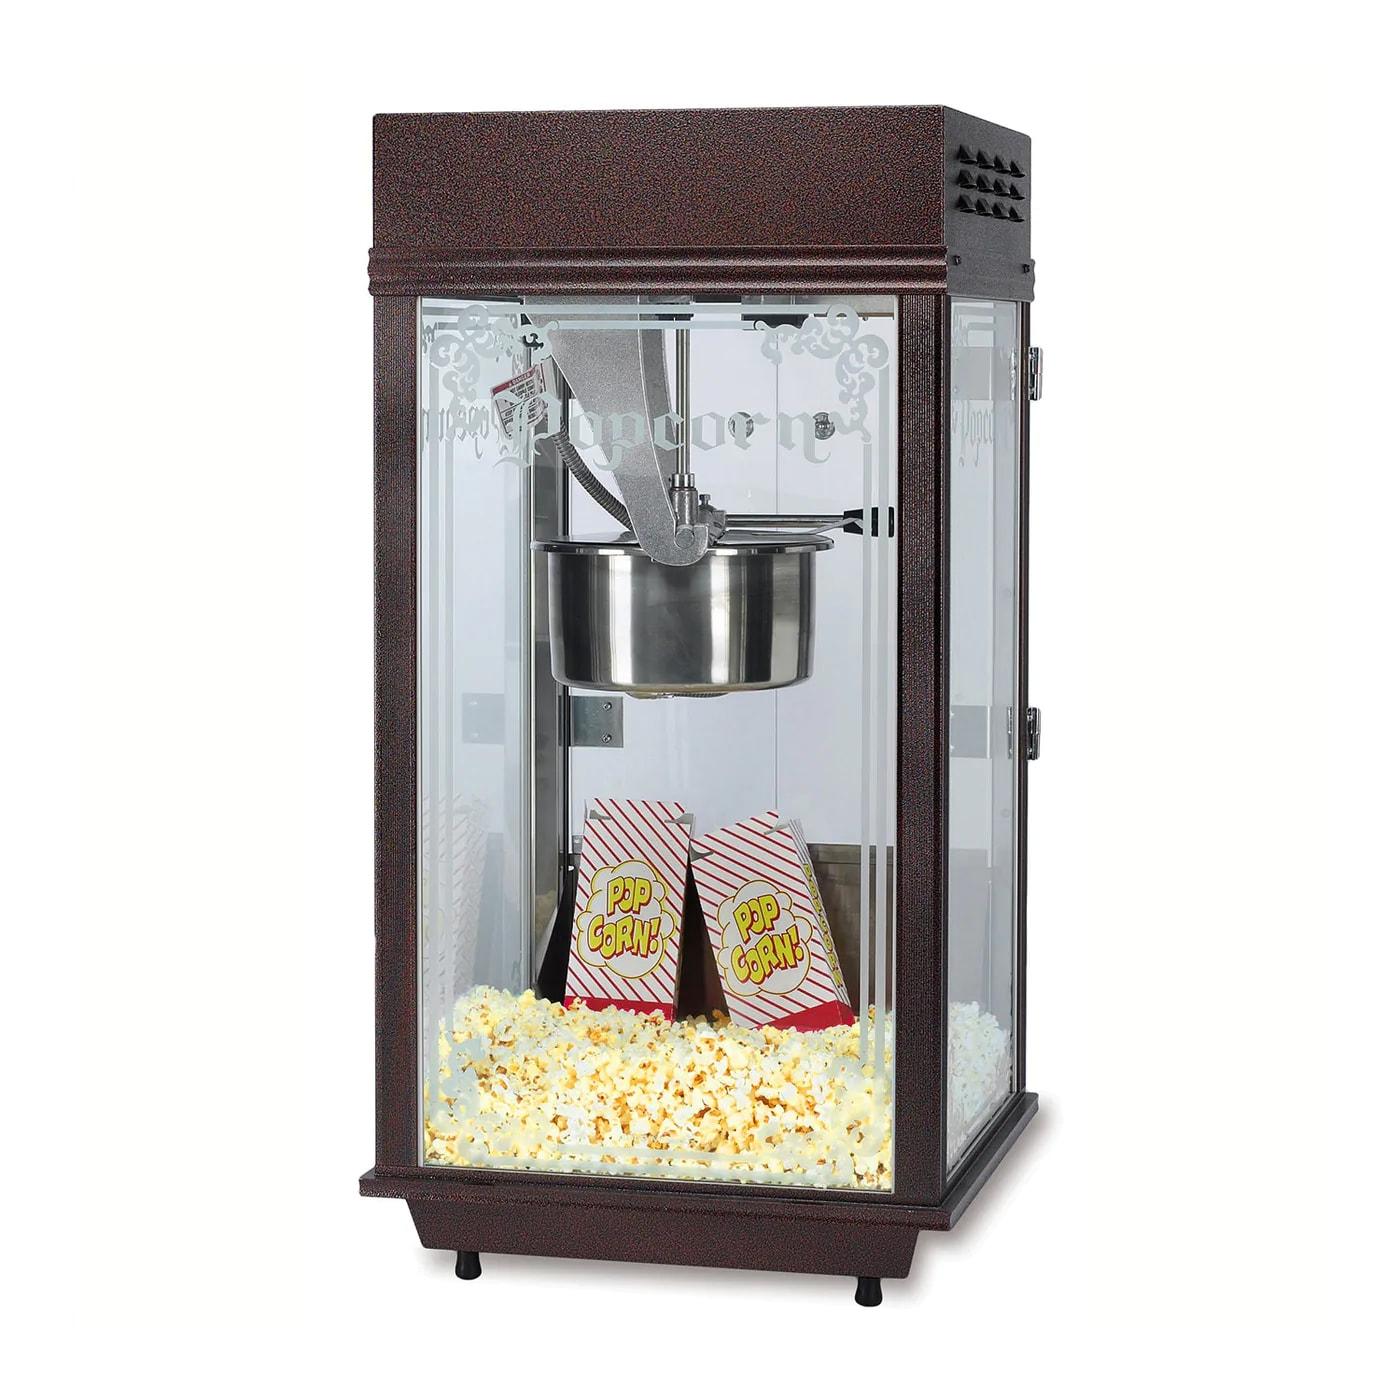 Gold Medal 2212 Mega Pop Popcorn Machine w/ 250 oz/hr Capacity & Copper Vein Finish, 120v